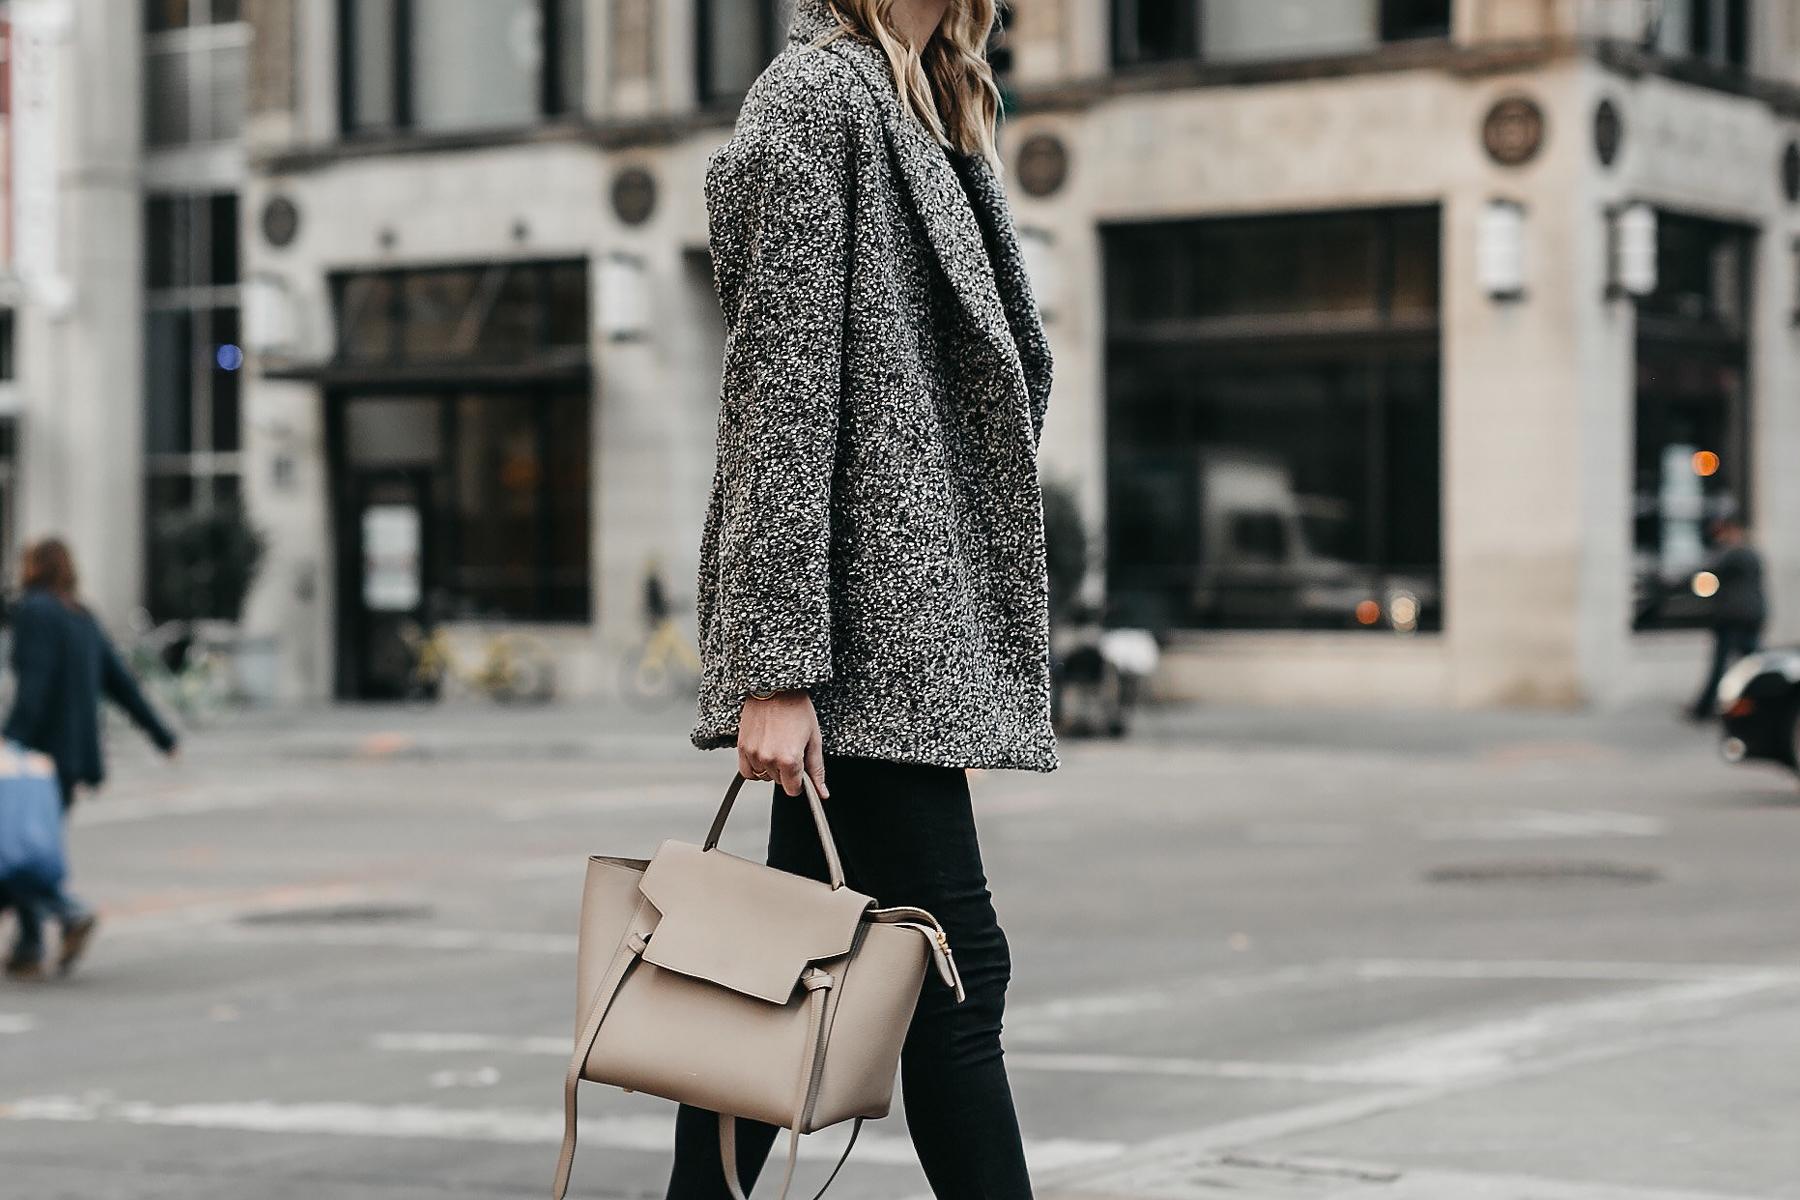 Abercrombie & Fitch Grey Boucle Coat Black Skinny Jeans Celine Mini Belt Bag Fashion Jackson Dallas Blogger Fashion Blogger Street Style